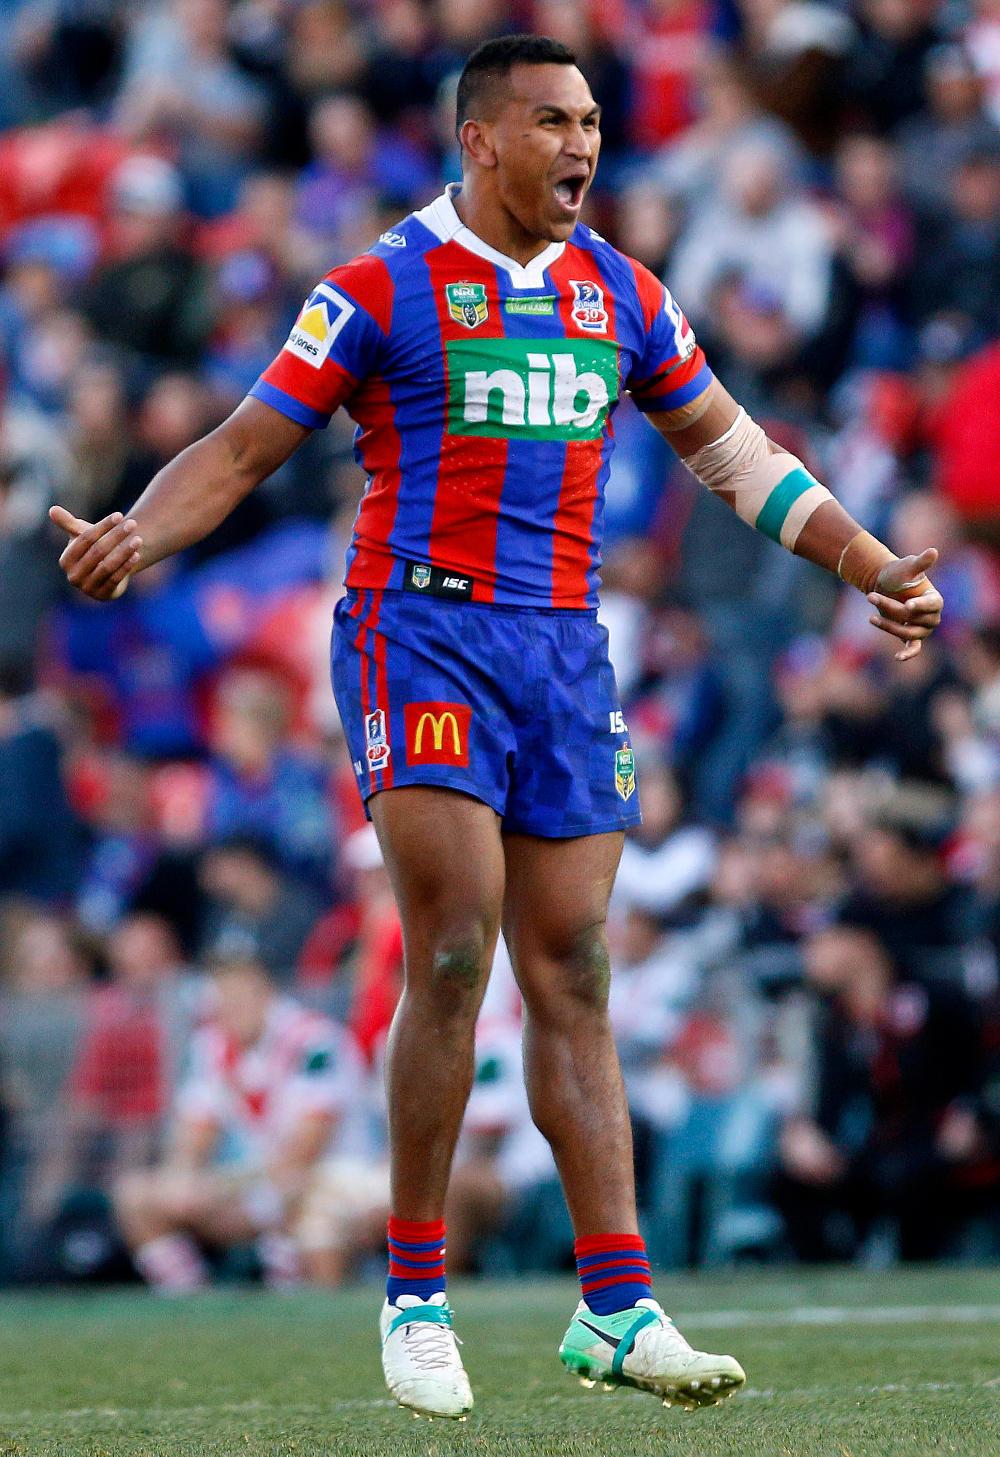 Jacob Saifiti Newcastle Knights NRL Rugby League 2017 tall